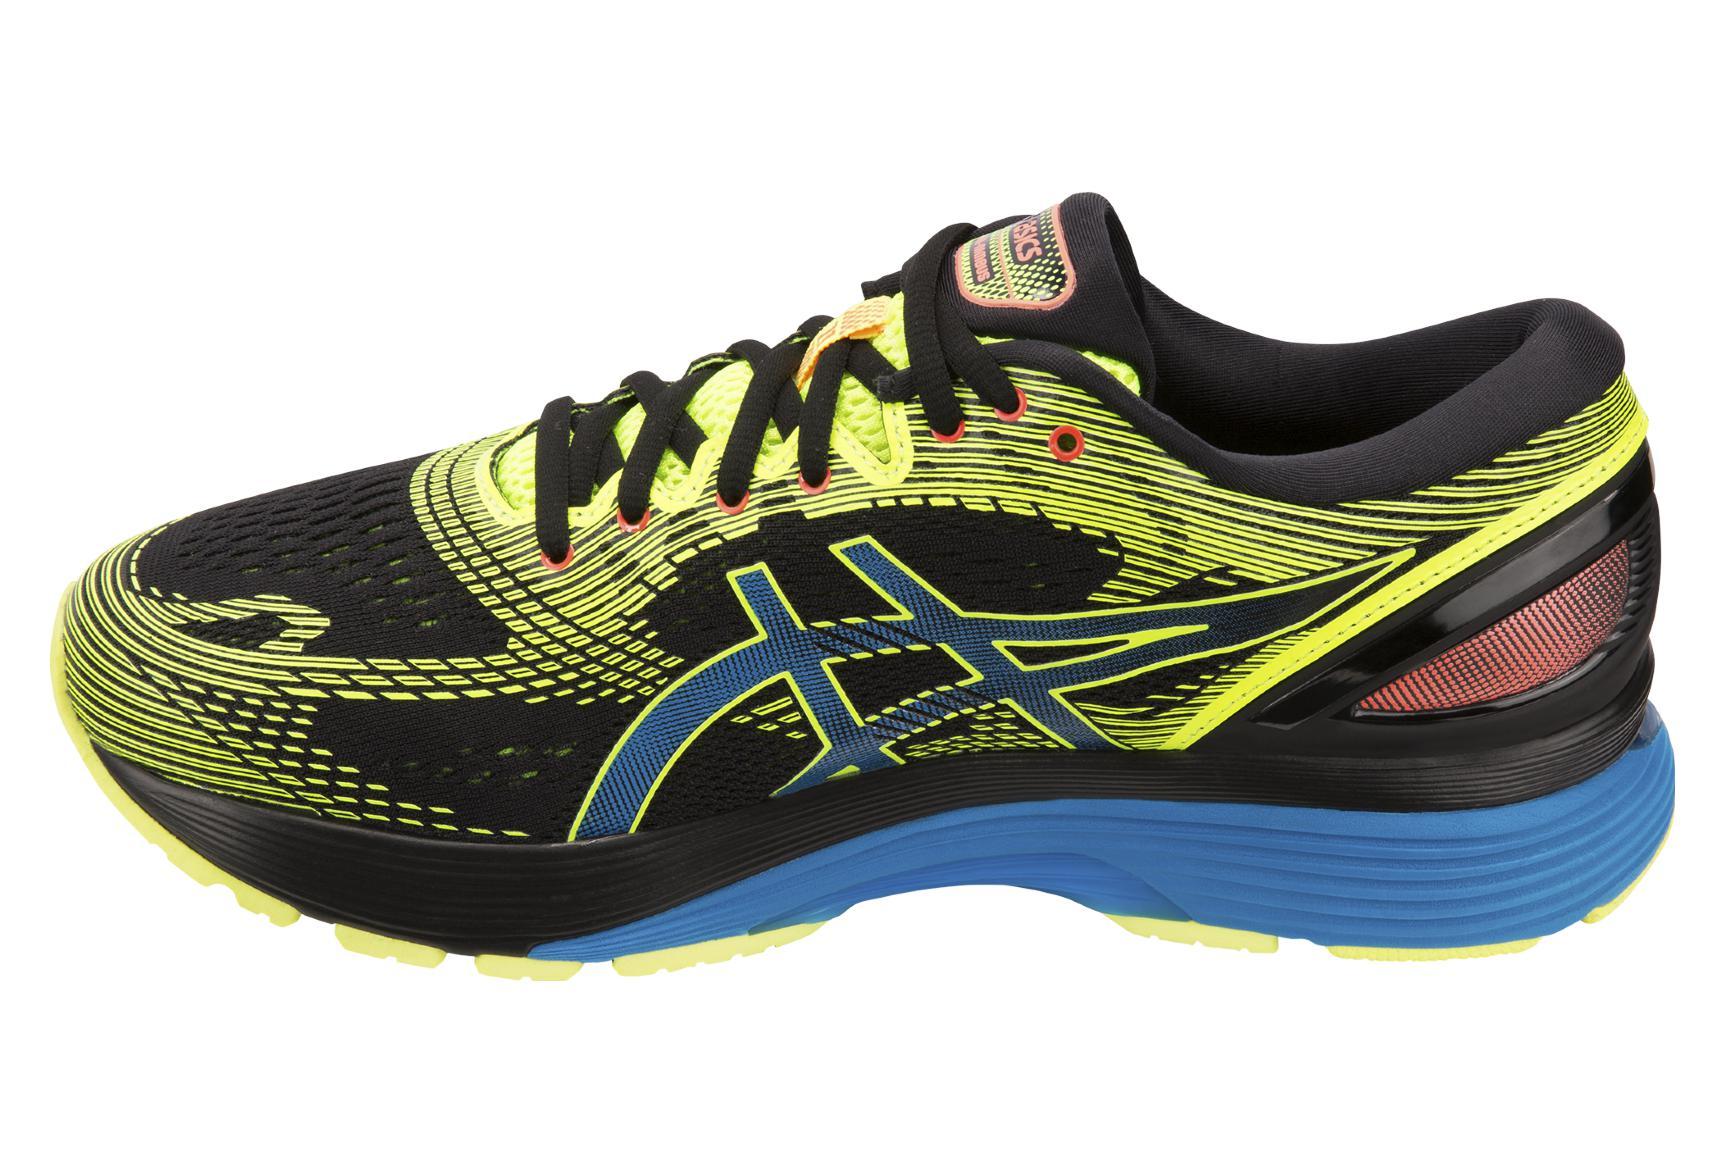 Asics Shoes Run Gel Nimbus 21 OPTIMISM Black Yellow Blue